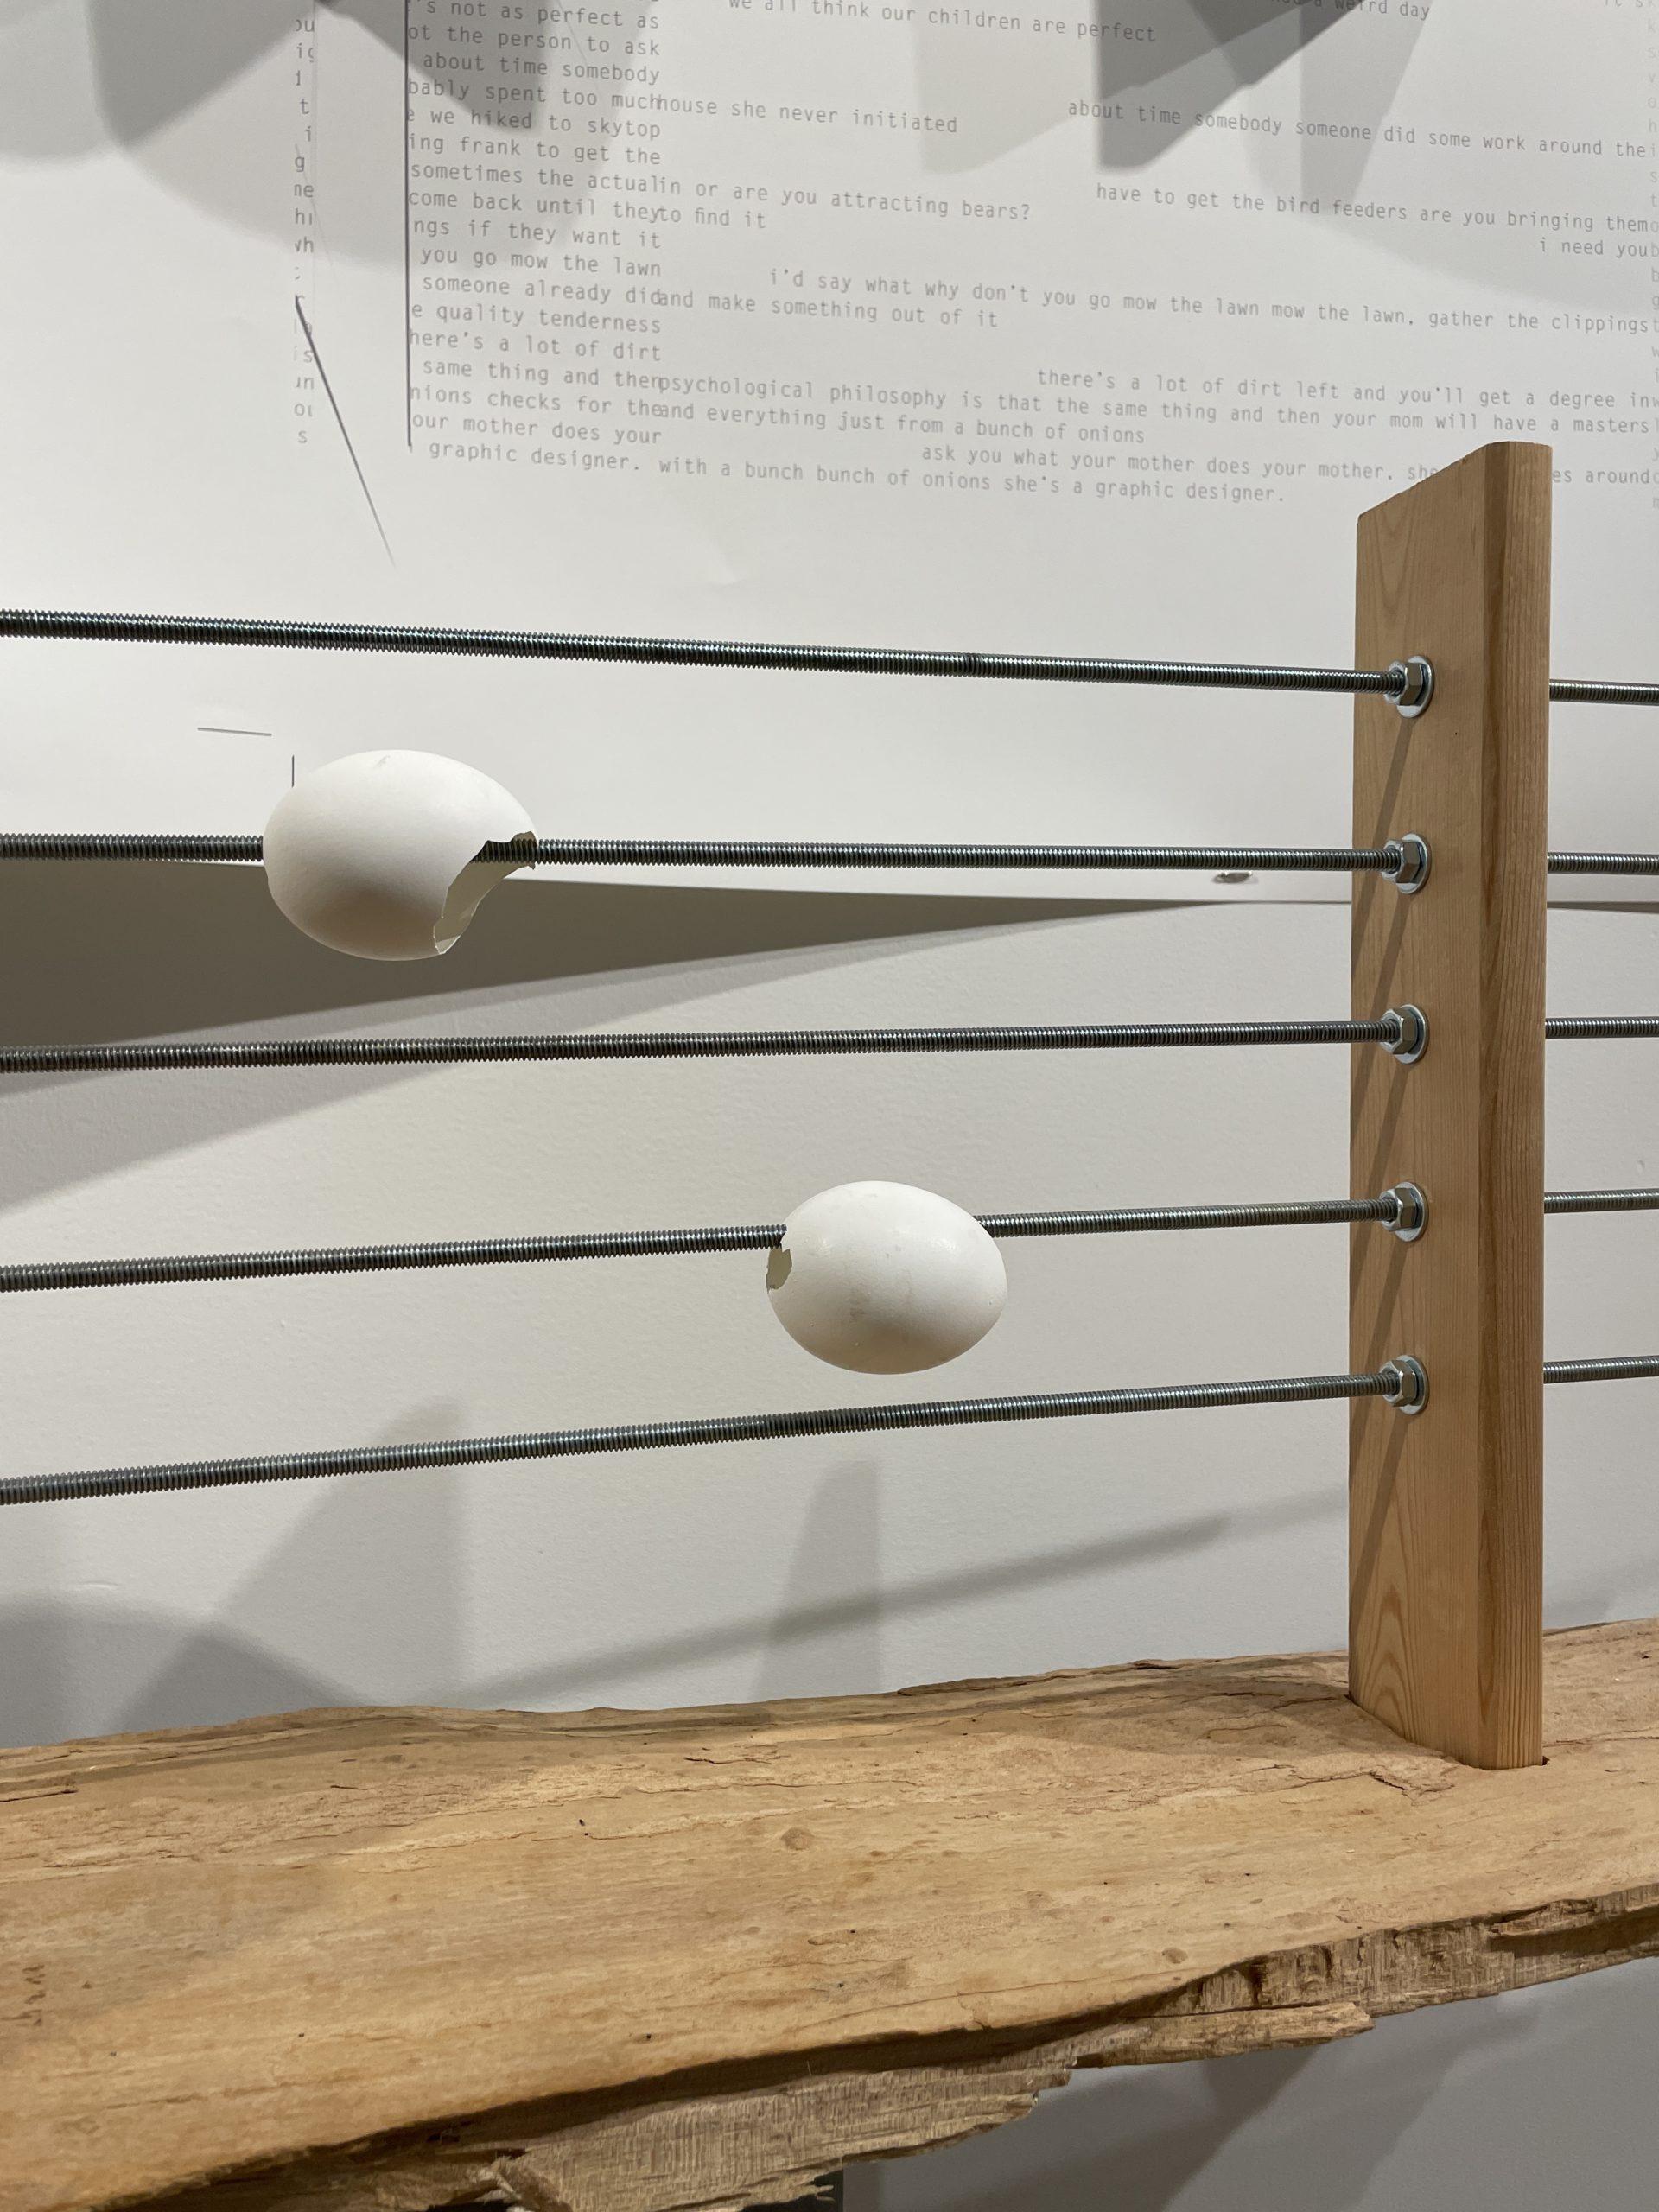 traversing with onions (2015) Sondra Graff